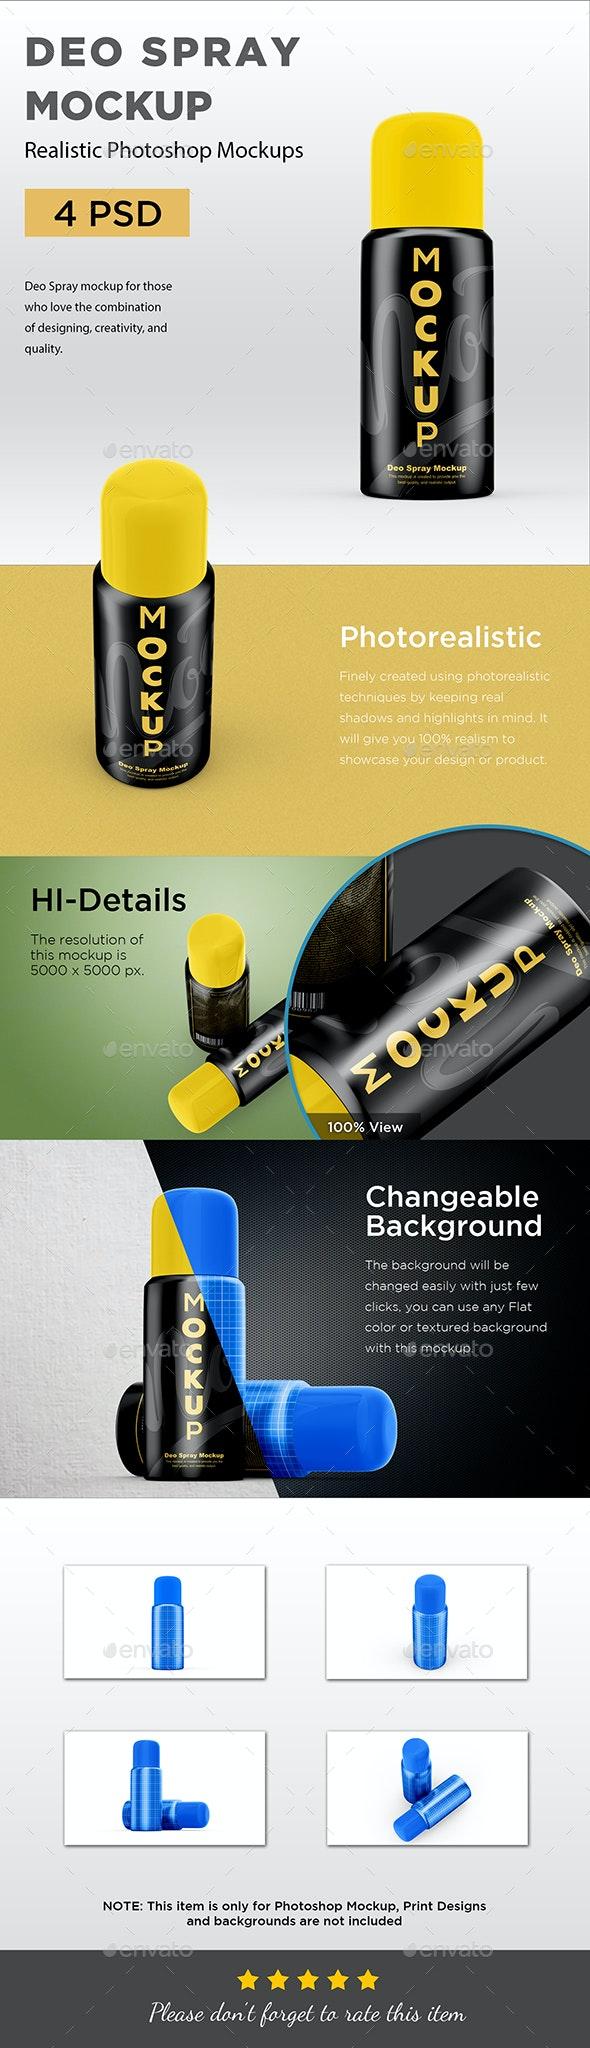 Deo Spray Mockup - Beauty Packaging